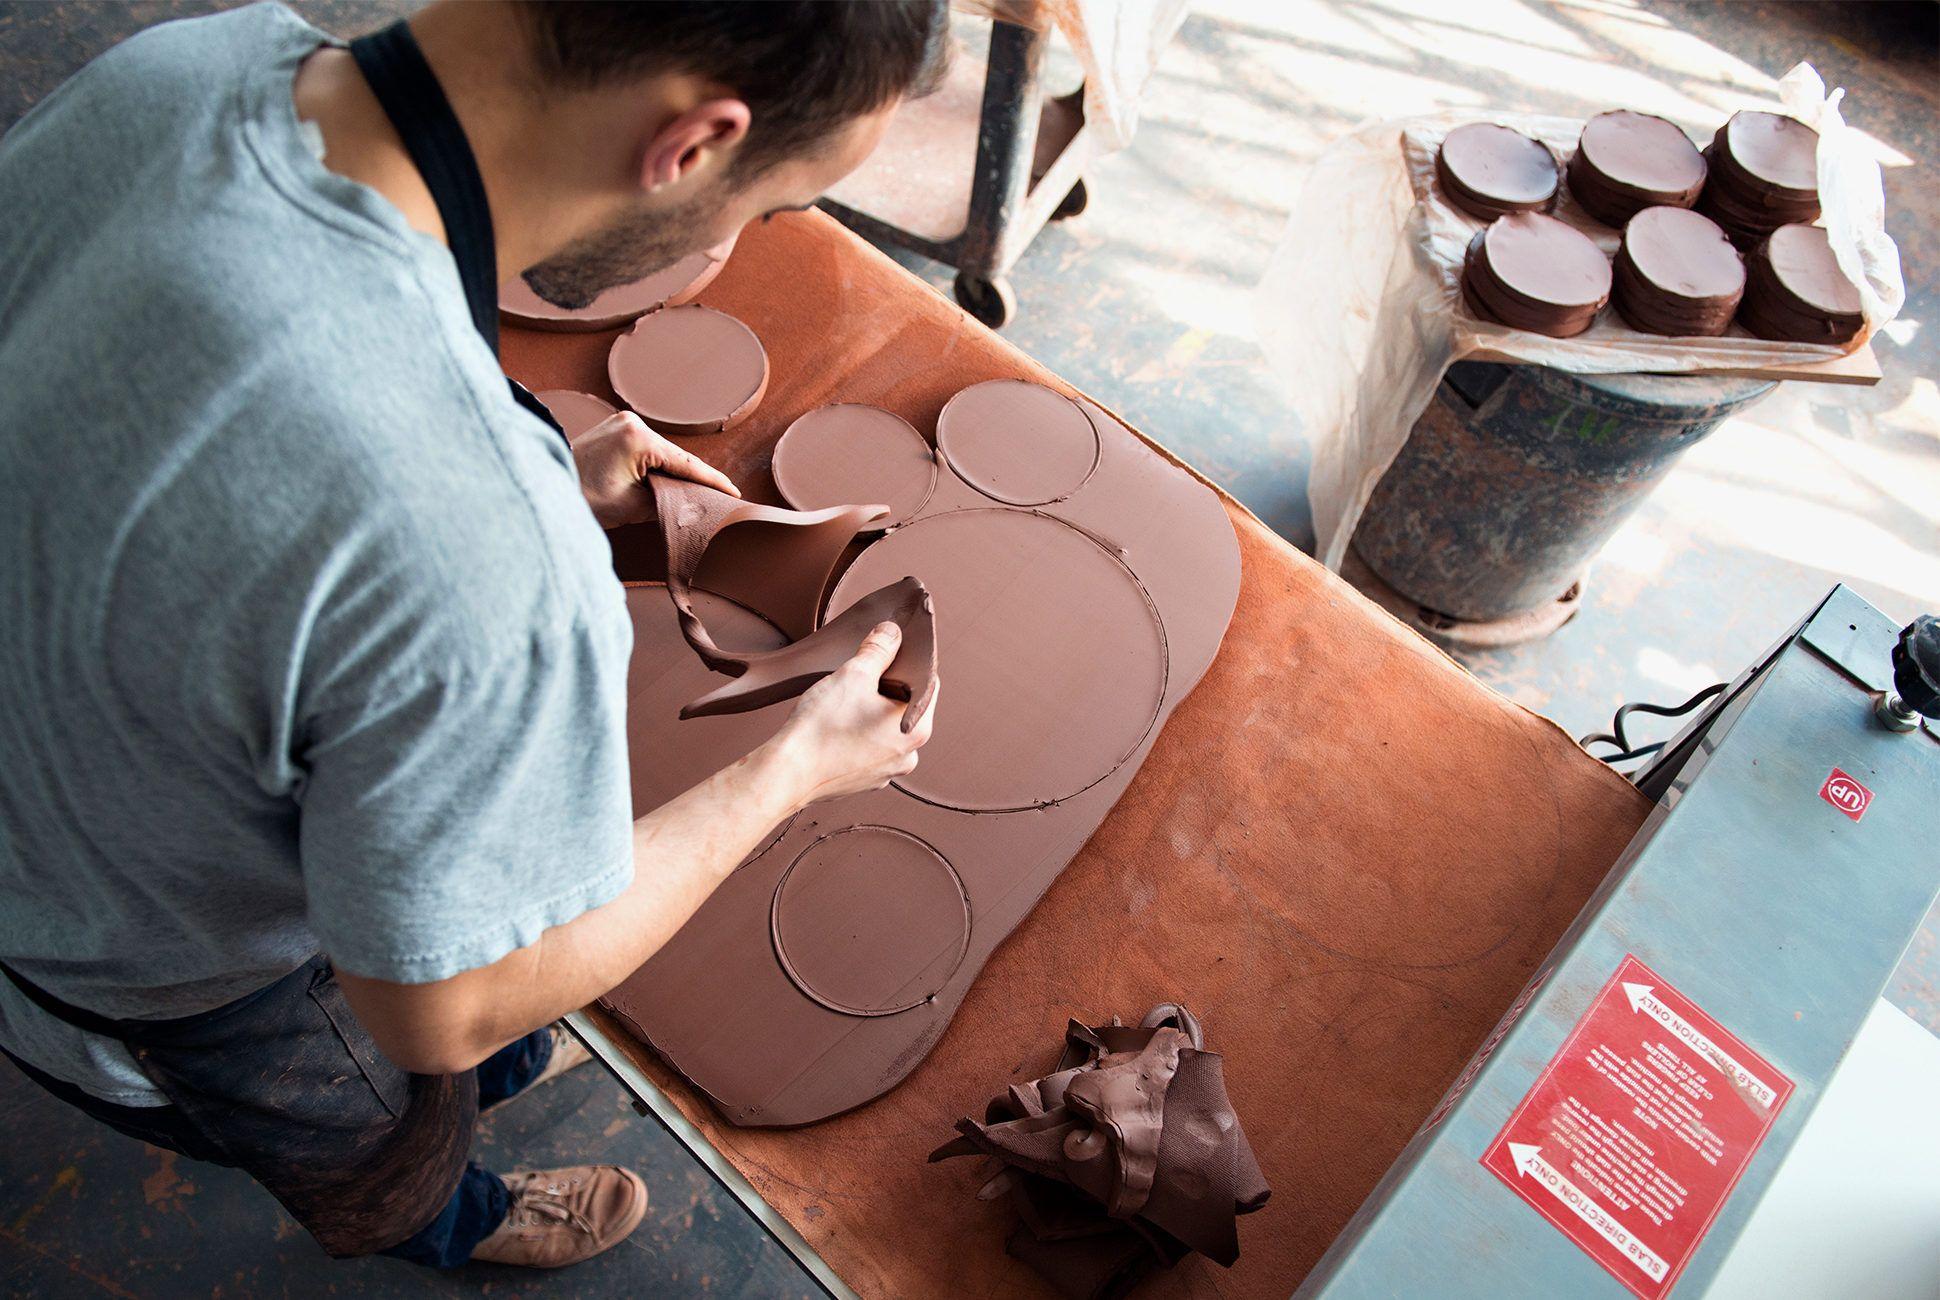 Jono-Pandolfi-pottery-gear-patrol-970-retina-2